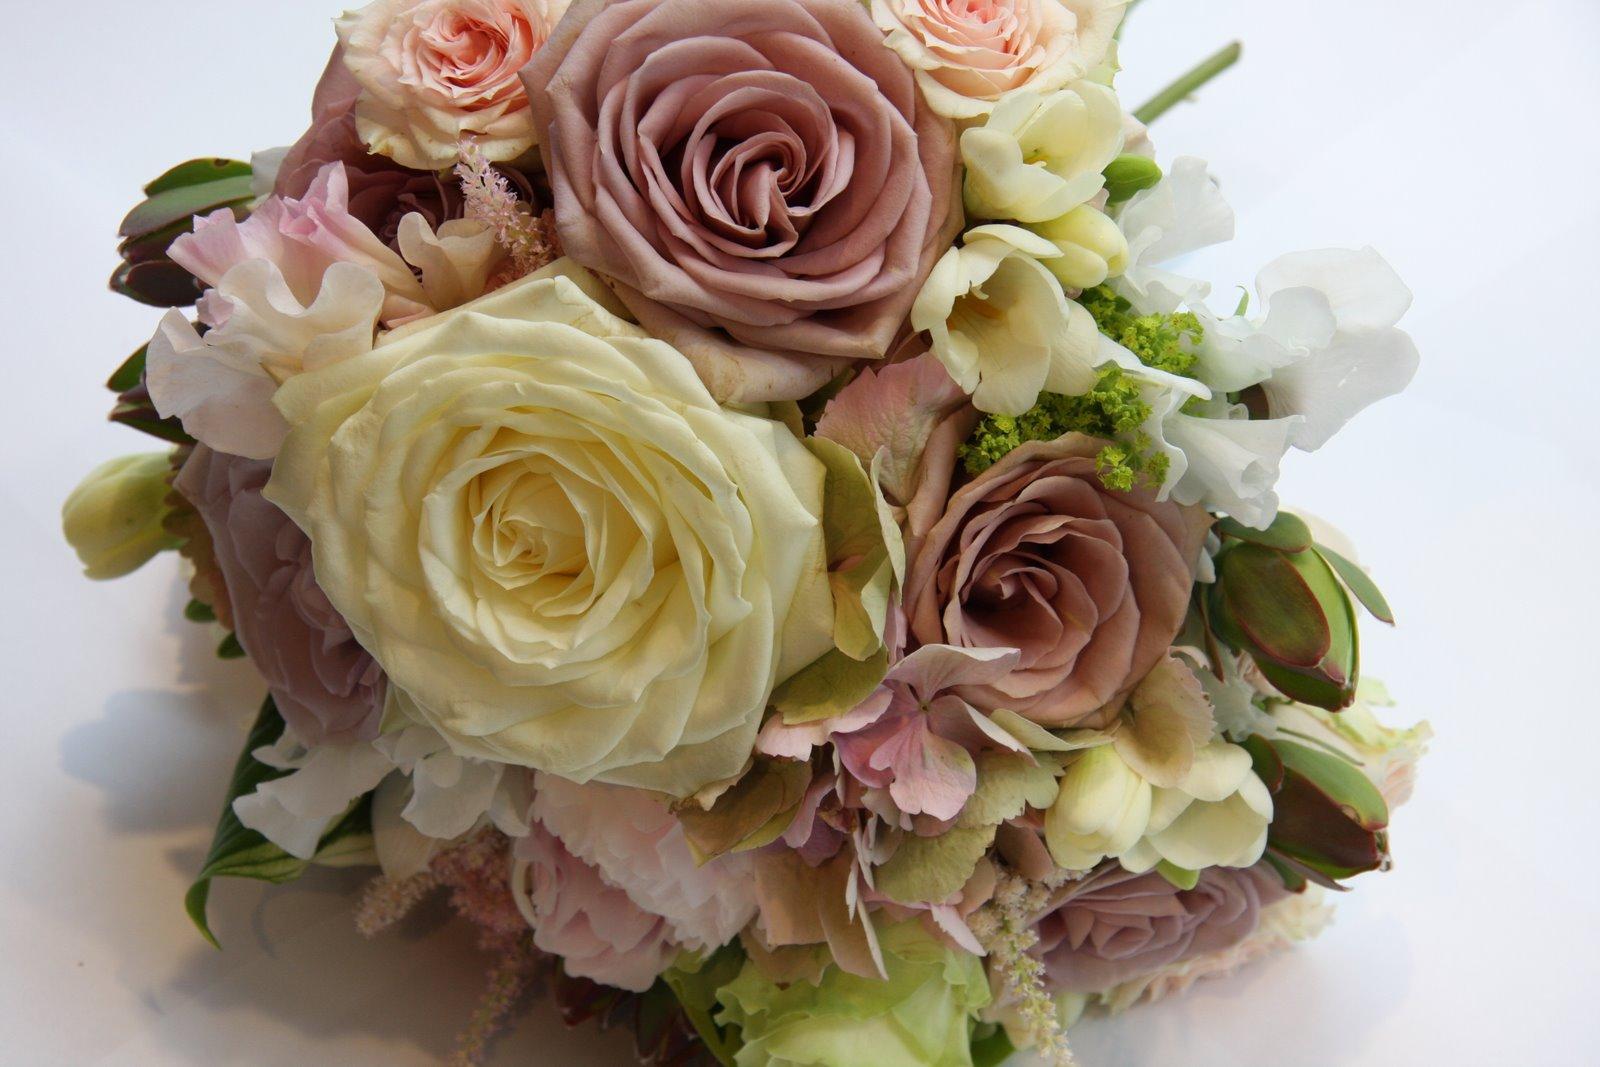 Vintage Wedding Flower Arrangements Pictures to Pin on Pinterest ...